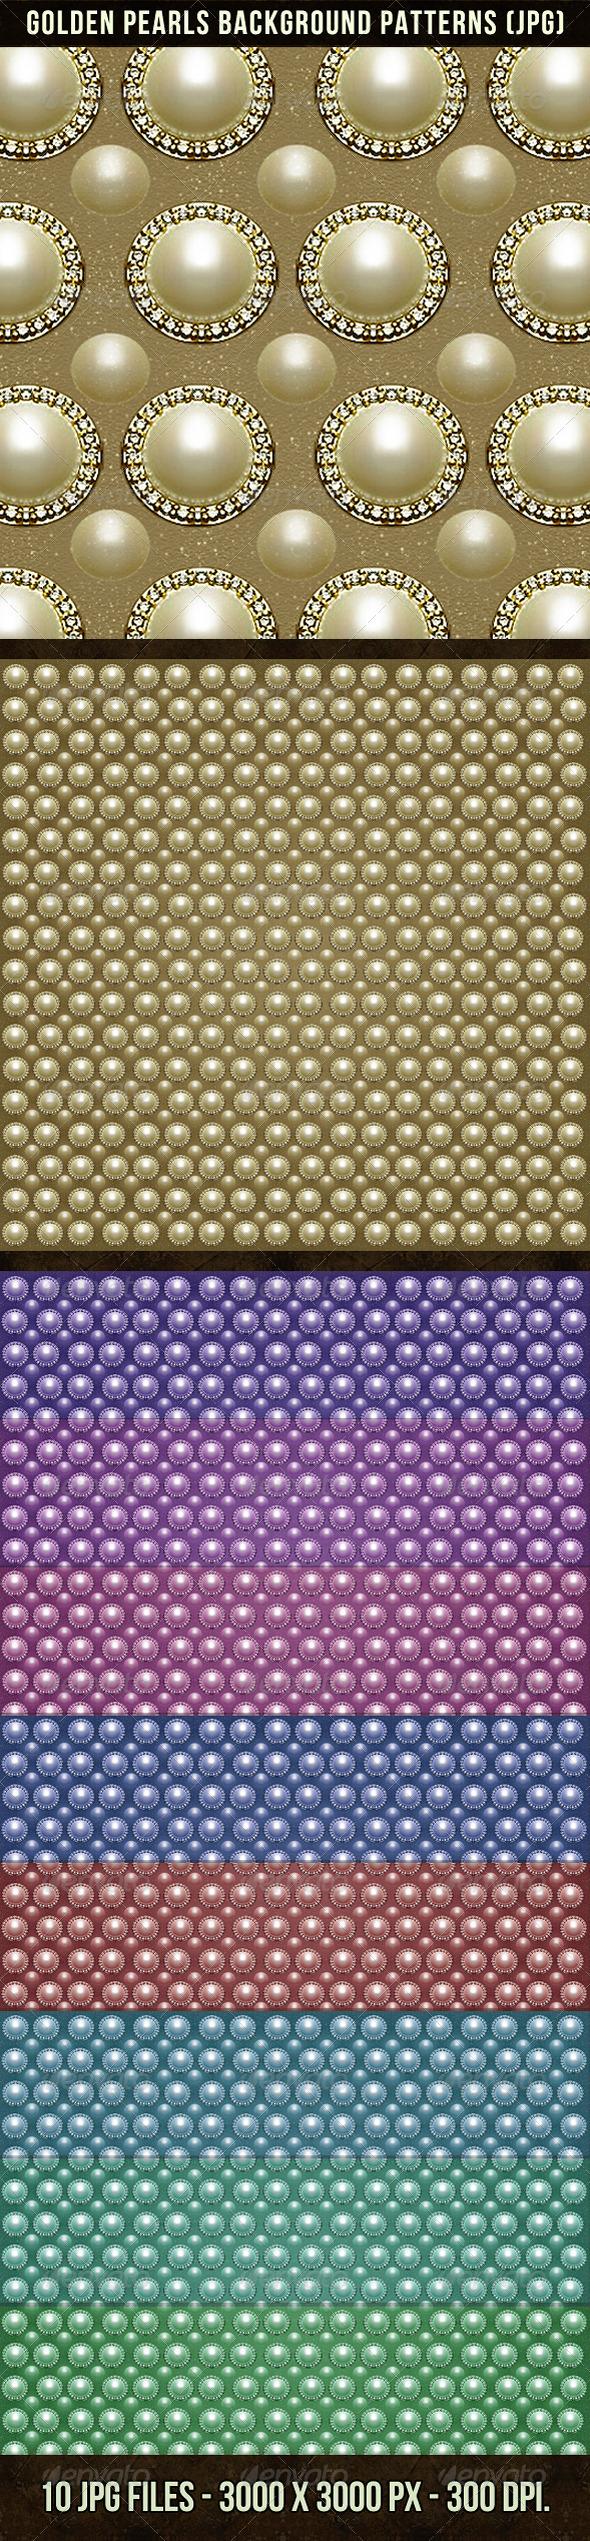 Golden Pearls Background Patterns - Patterns Decorative